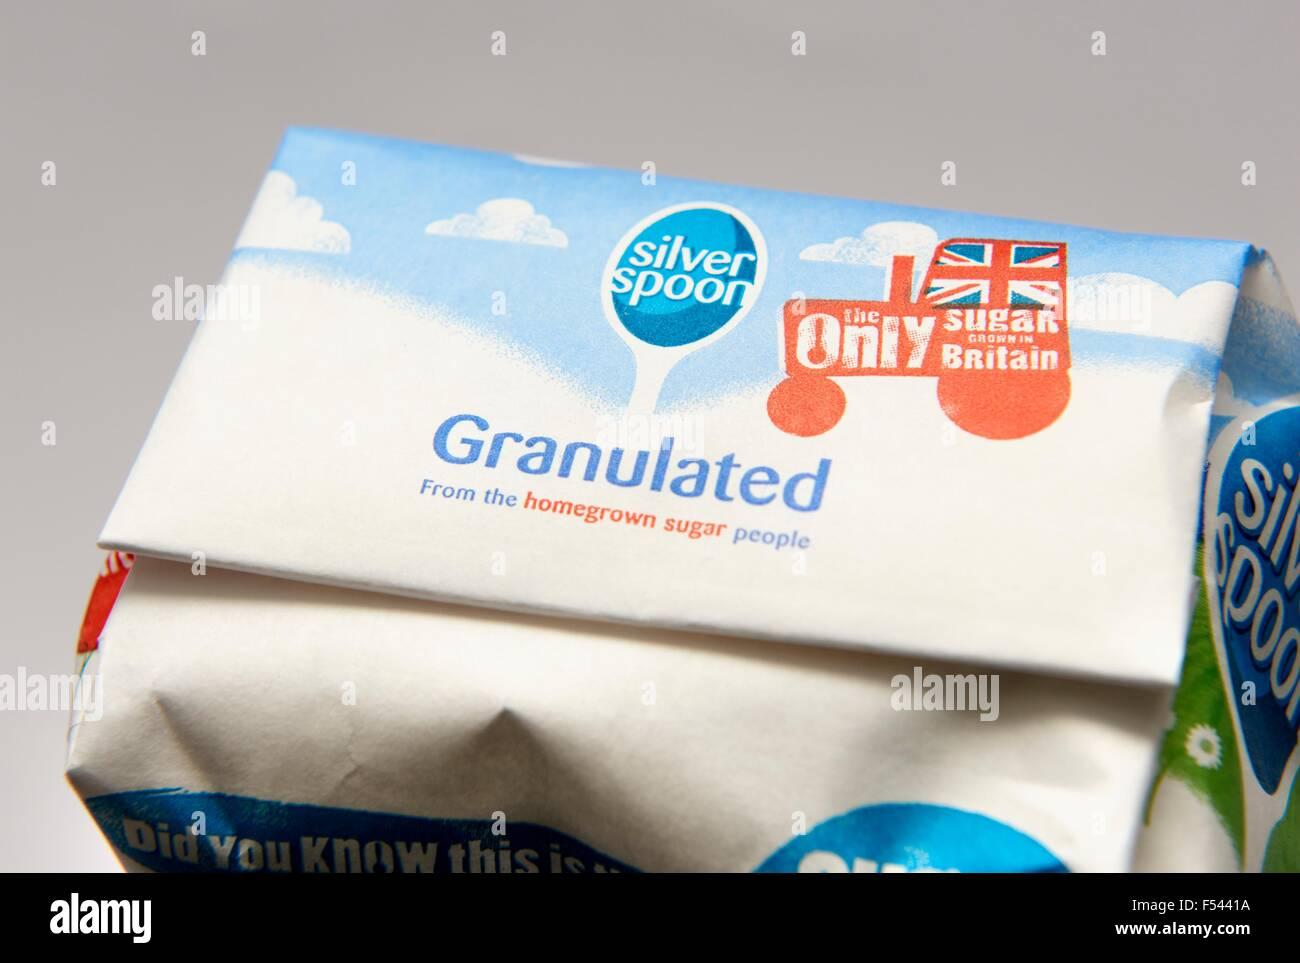 A 1 kilo bag of sugar - Stock Image